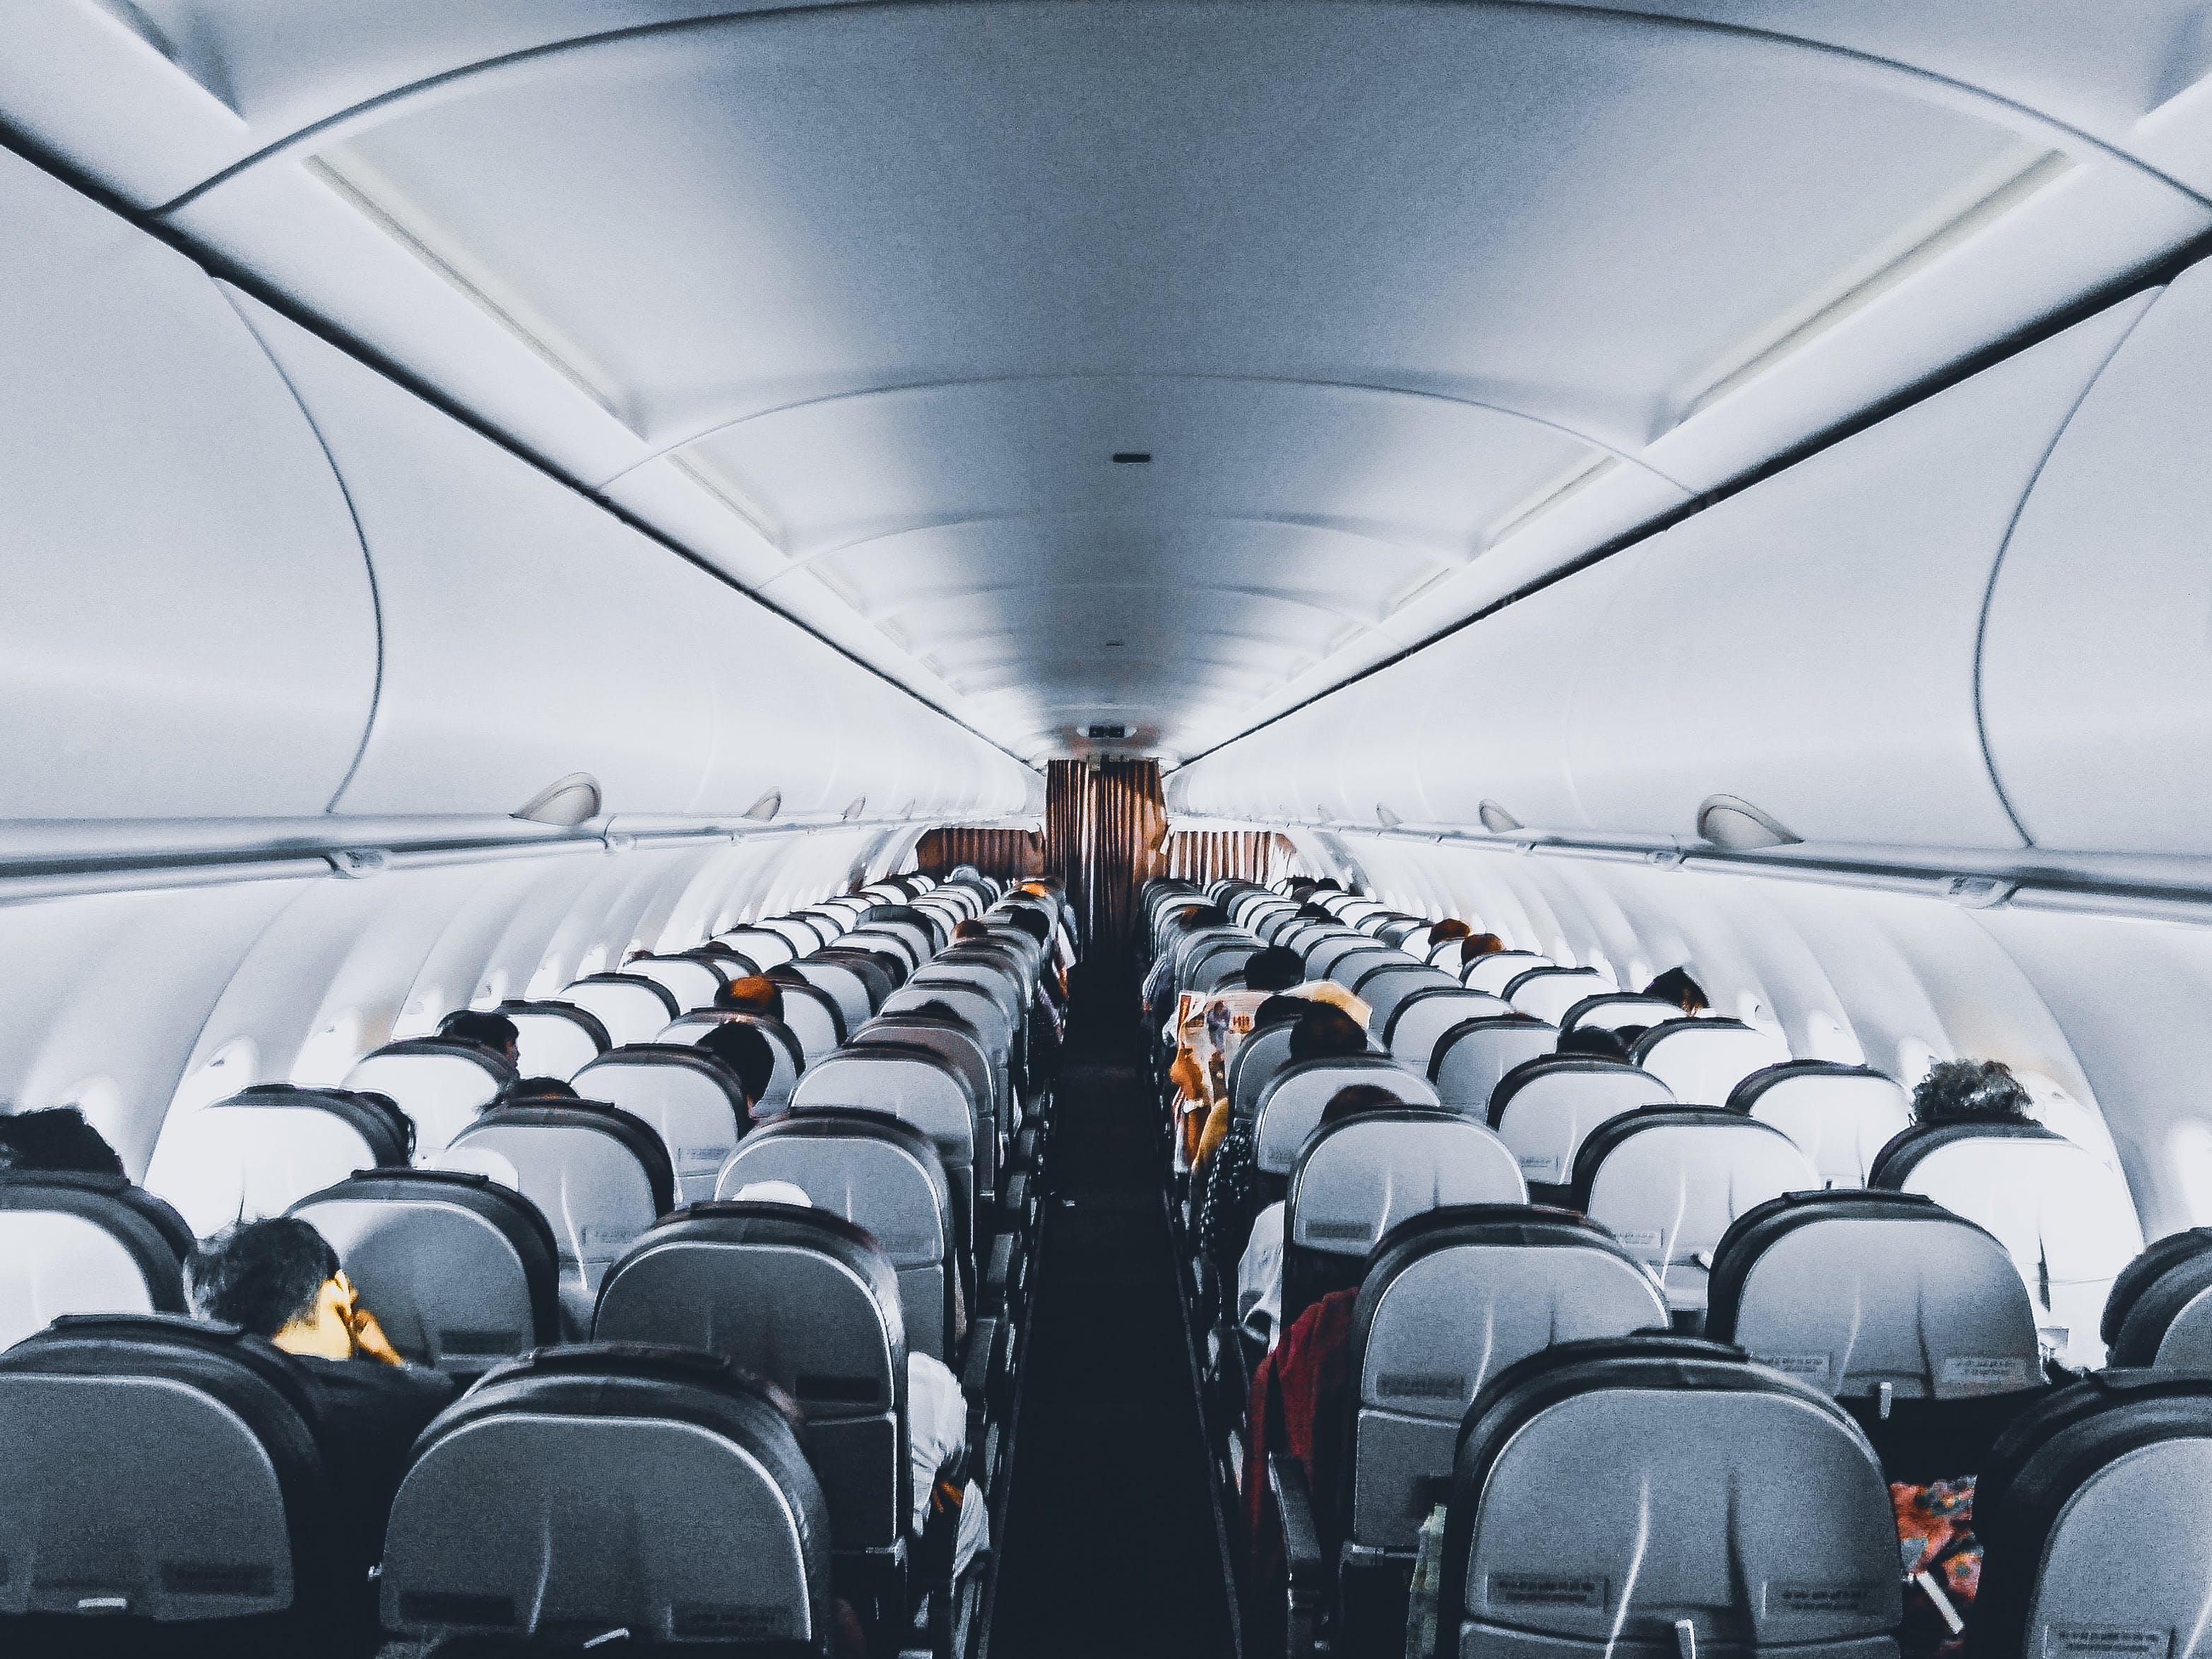 Kostenloses Stock Foto zu fahrzeug, fenster, flug, fluggesellschaft